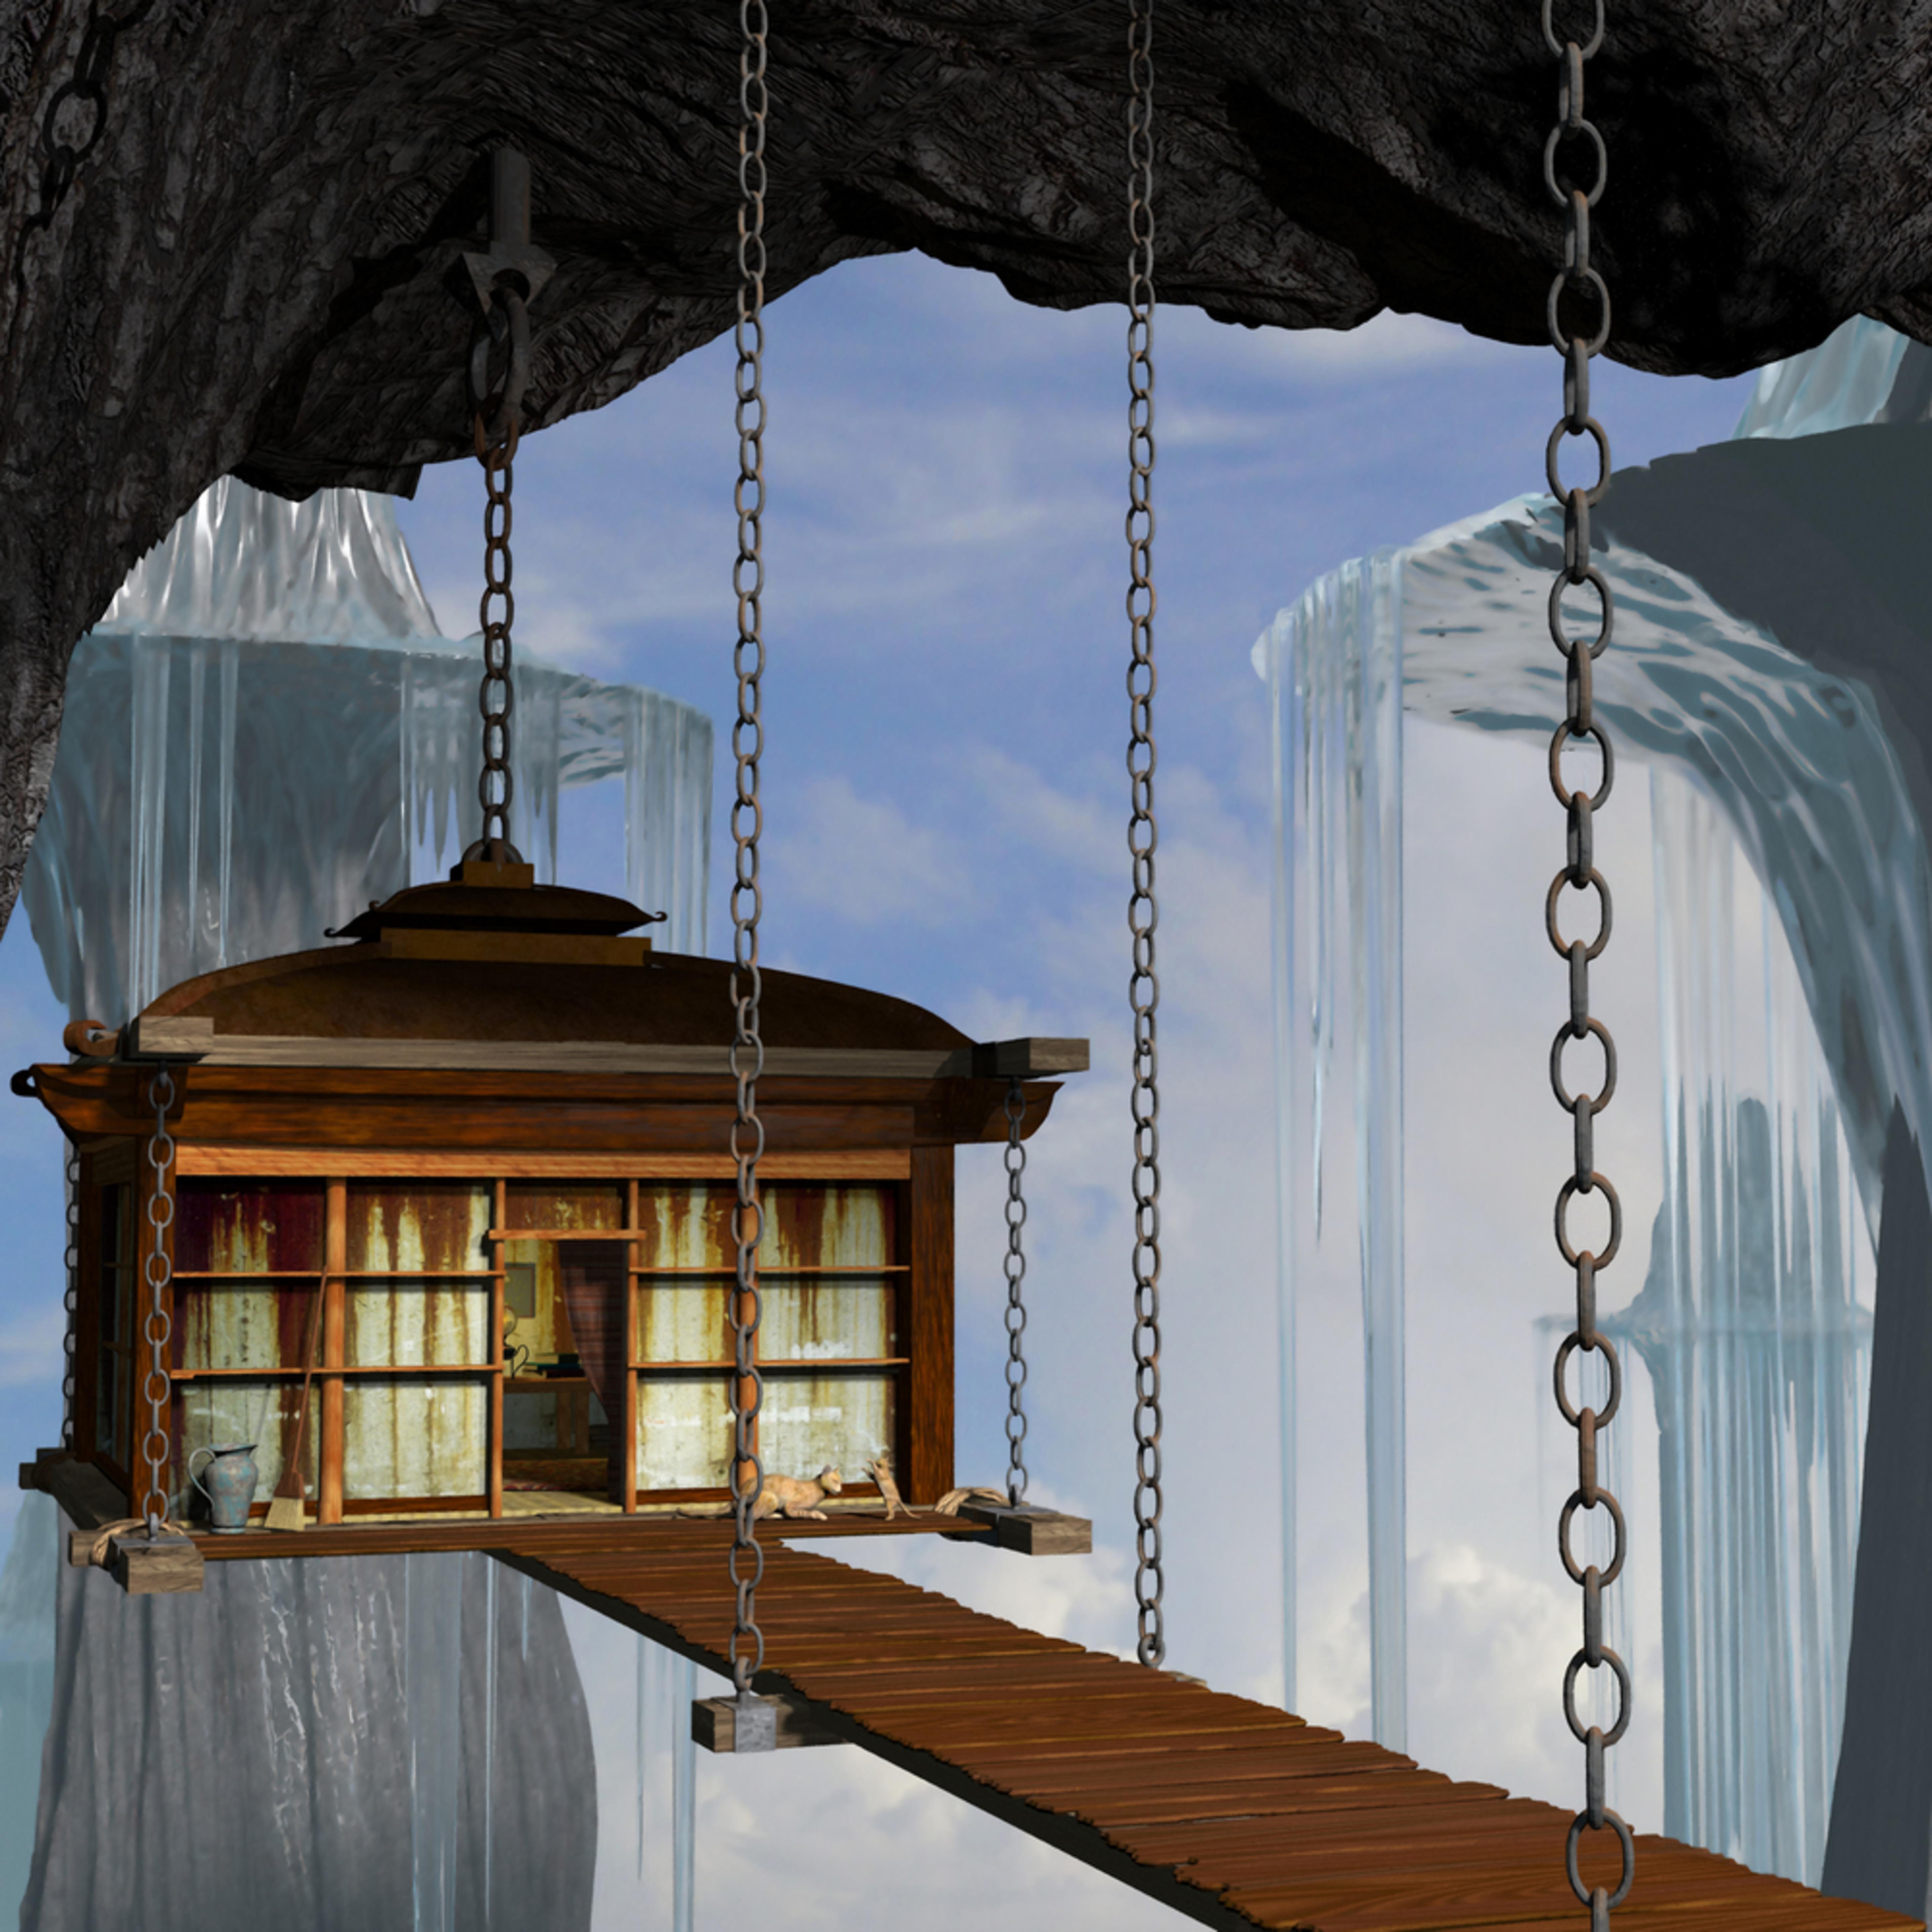 Cdecker hanginghouse 7851 mlecfc